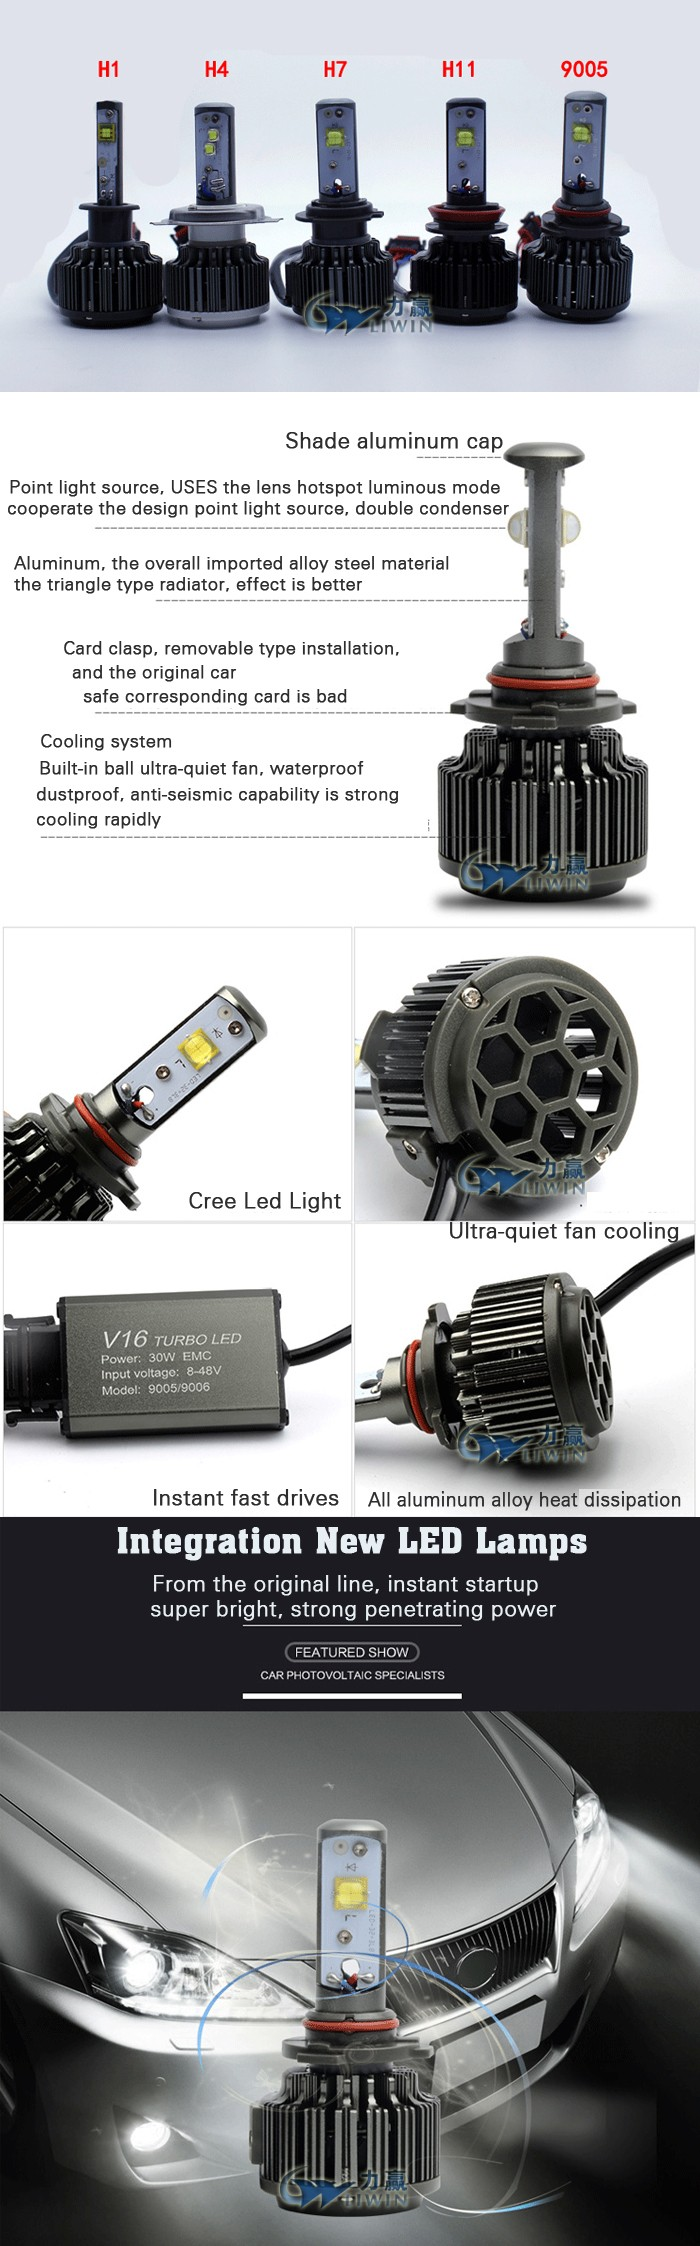 LH57 led headlight-1.jpg